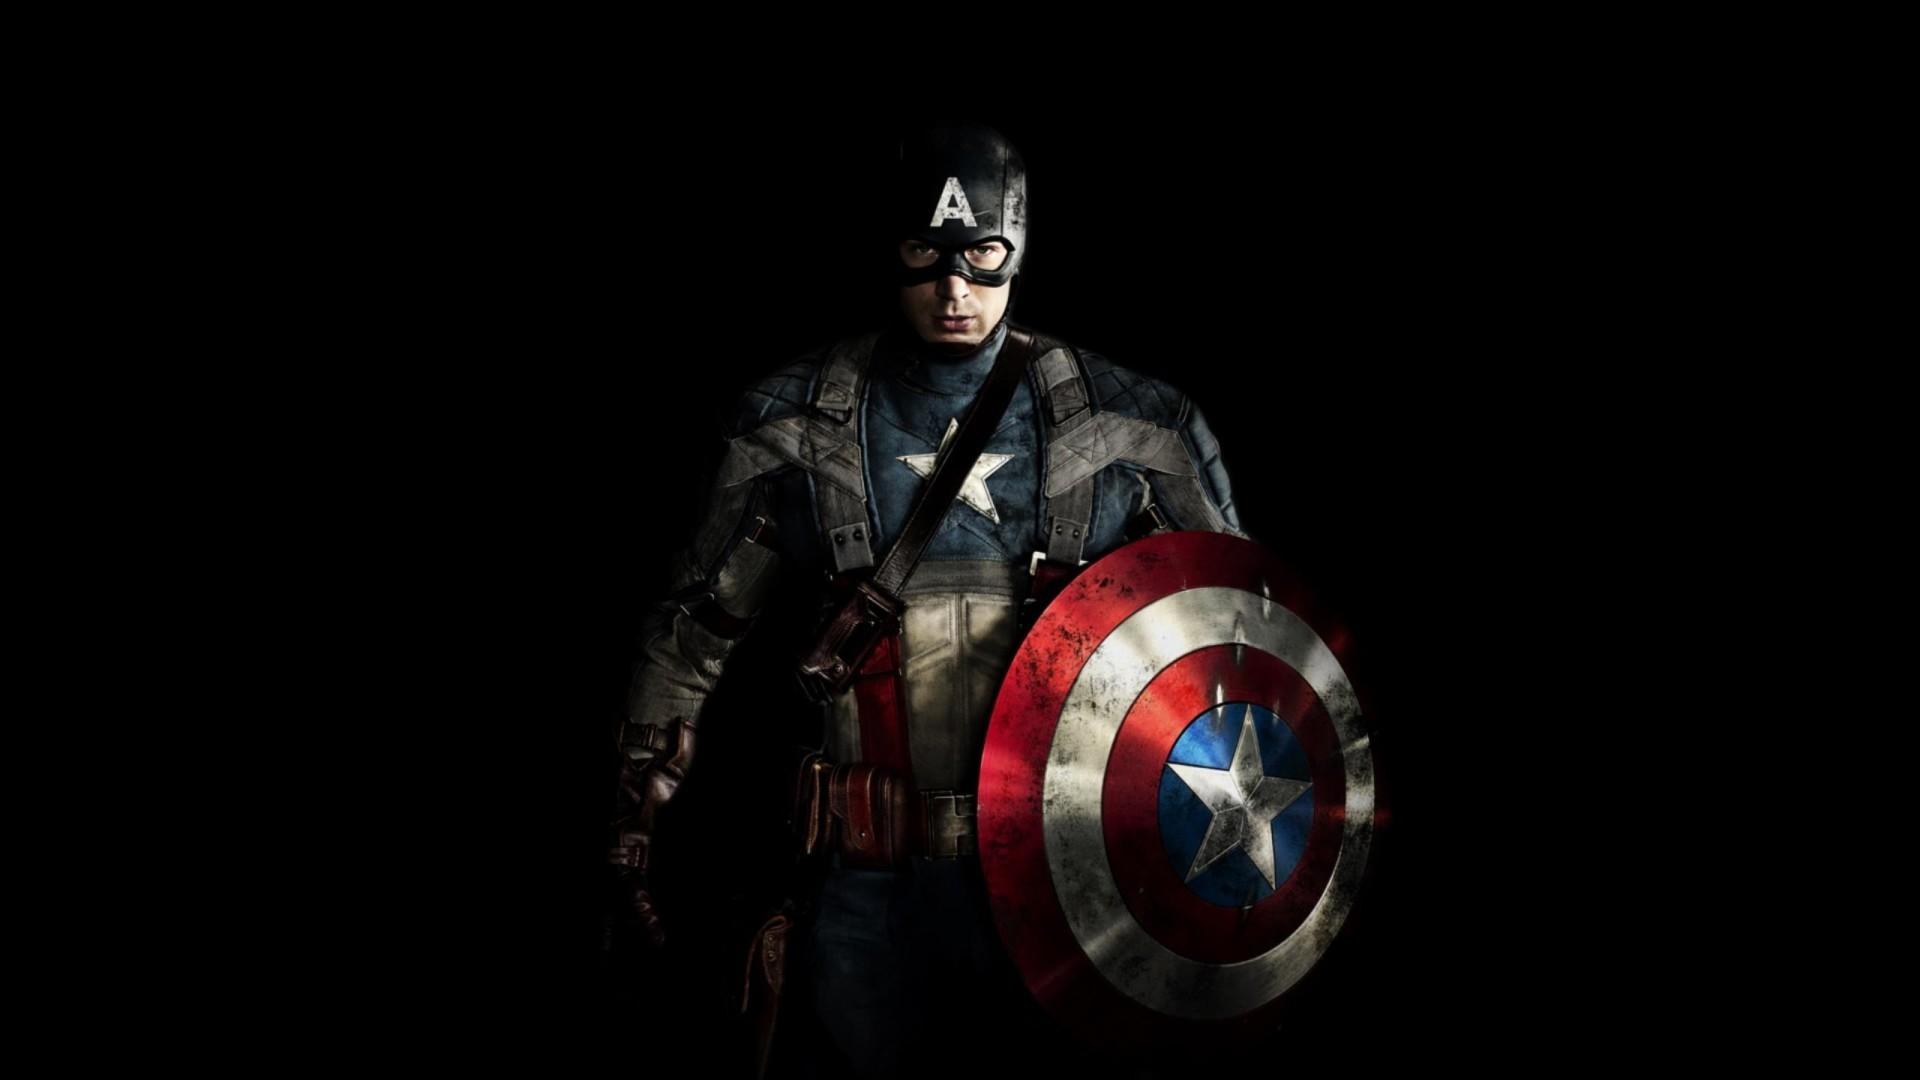 Hd wallpaper of captain america – Chris Evans Is Captain America Wallpaper